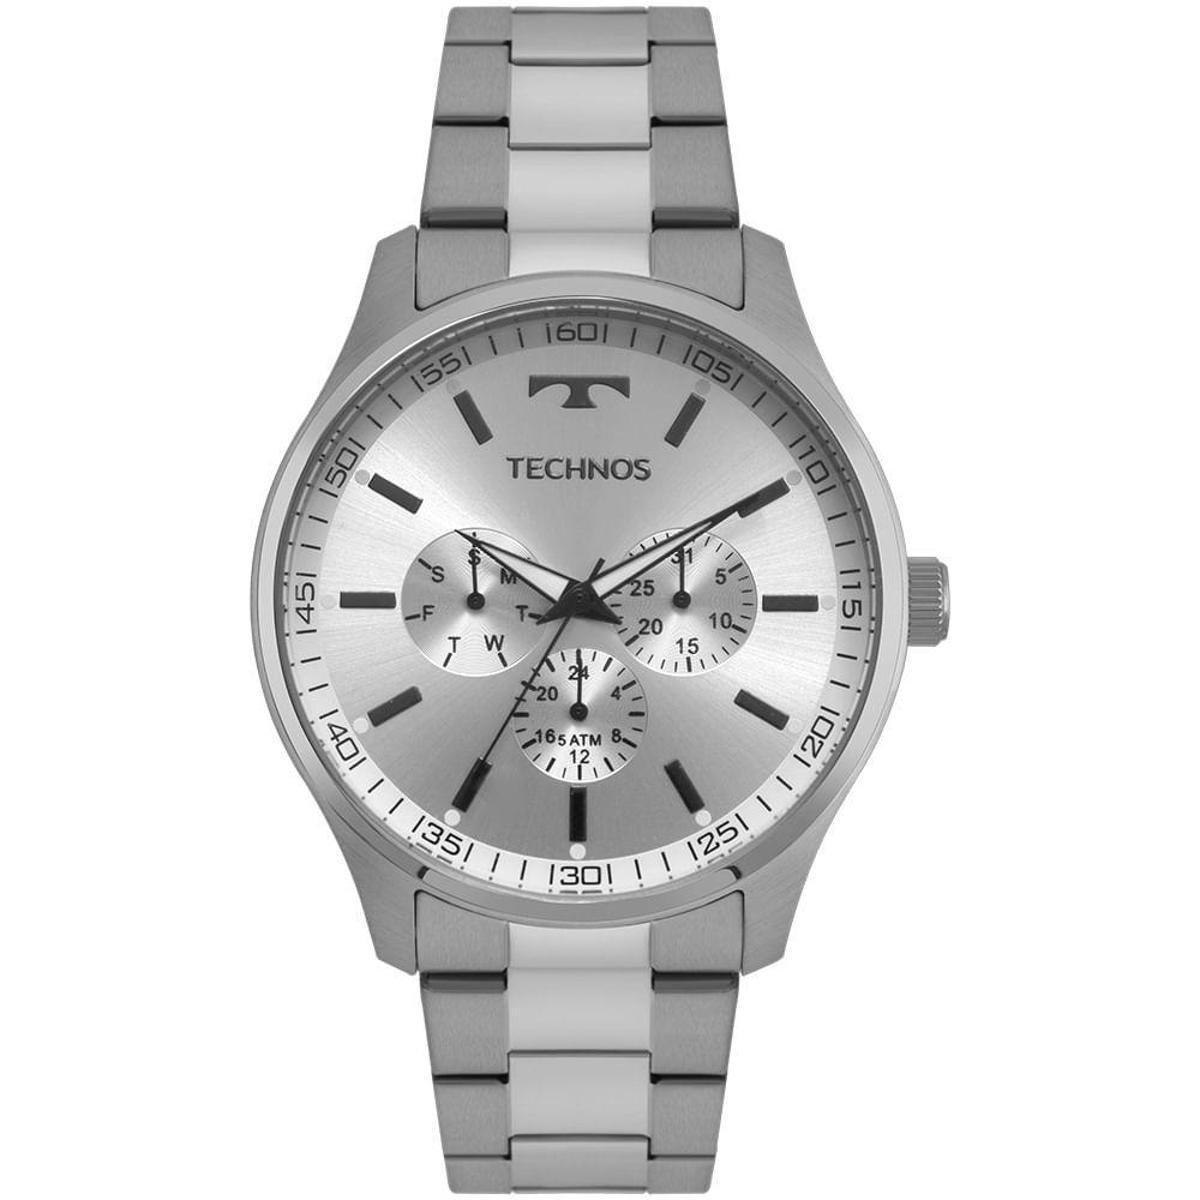 92da867c9b608 Relógio Technos Masculino Steel - 6P29AJO 1K 6P29AJO 1K - Prata ...